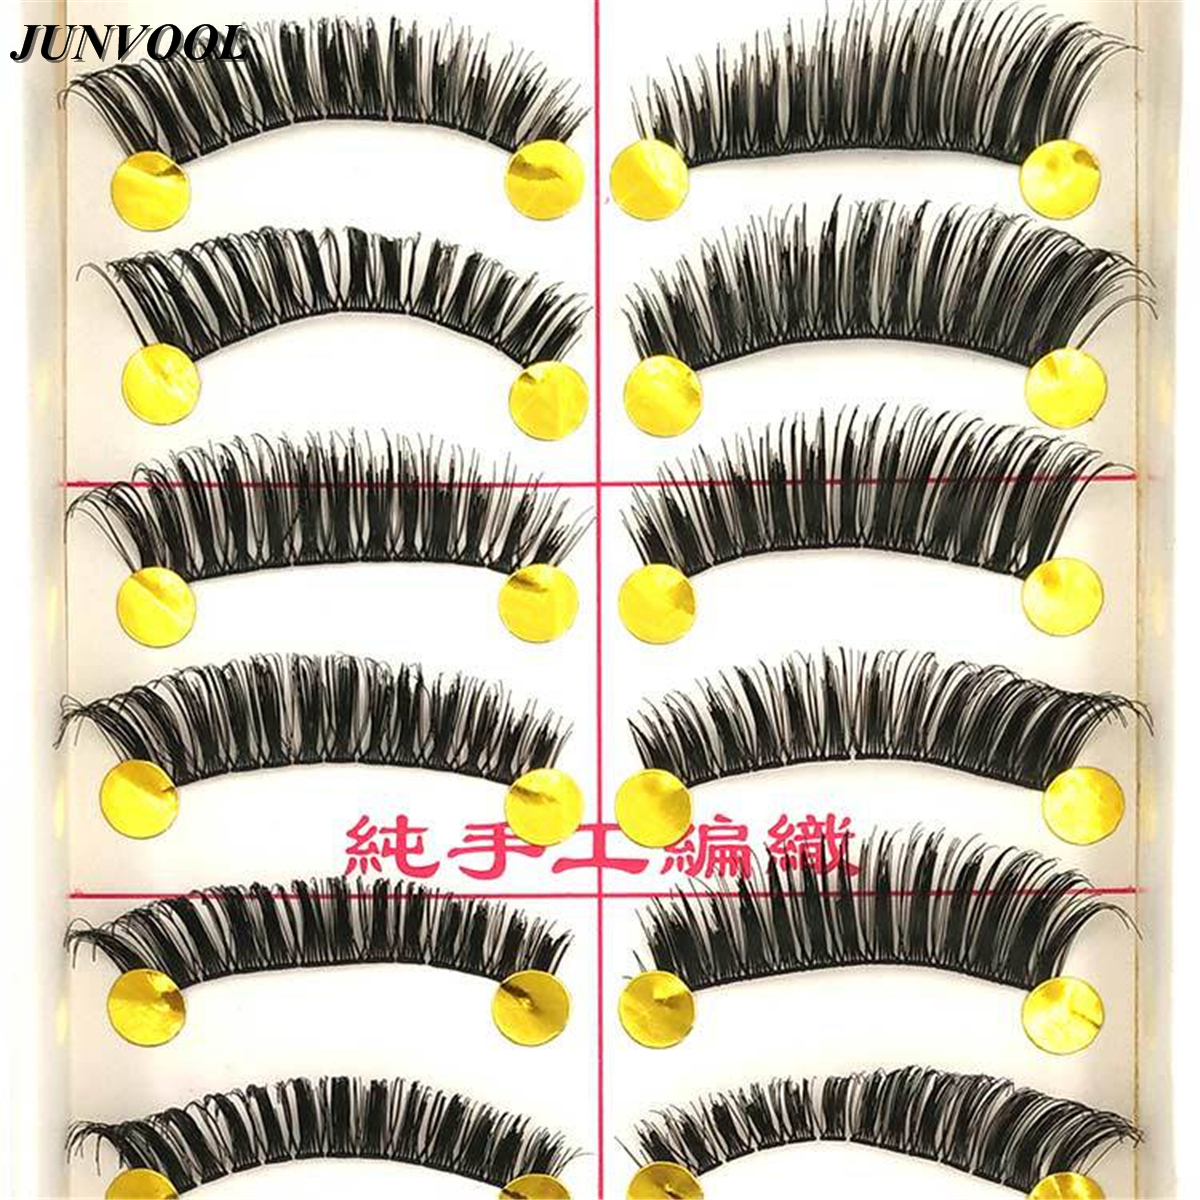 Charming Eye Lashes Beauty 60 Pairs New Natural Long Thick Black False Eyelashes Thick Fake Eye Lashes Makeup Tips High Quality